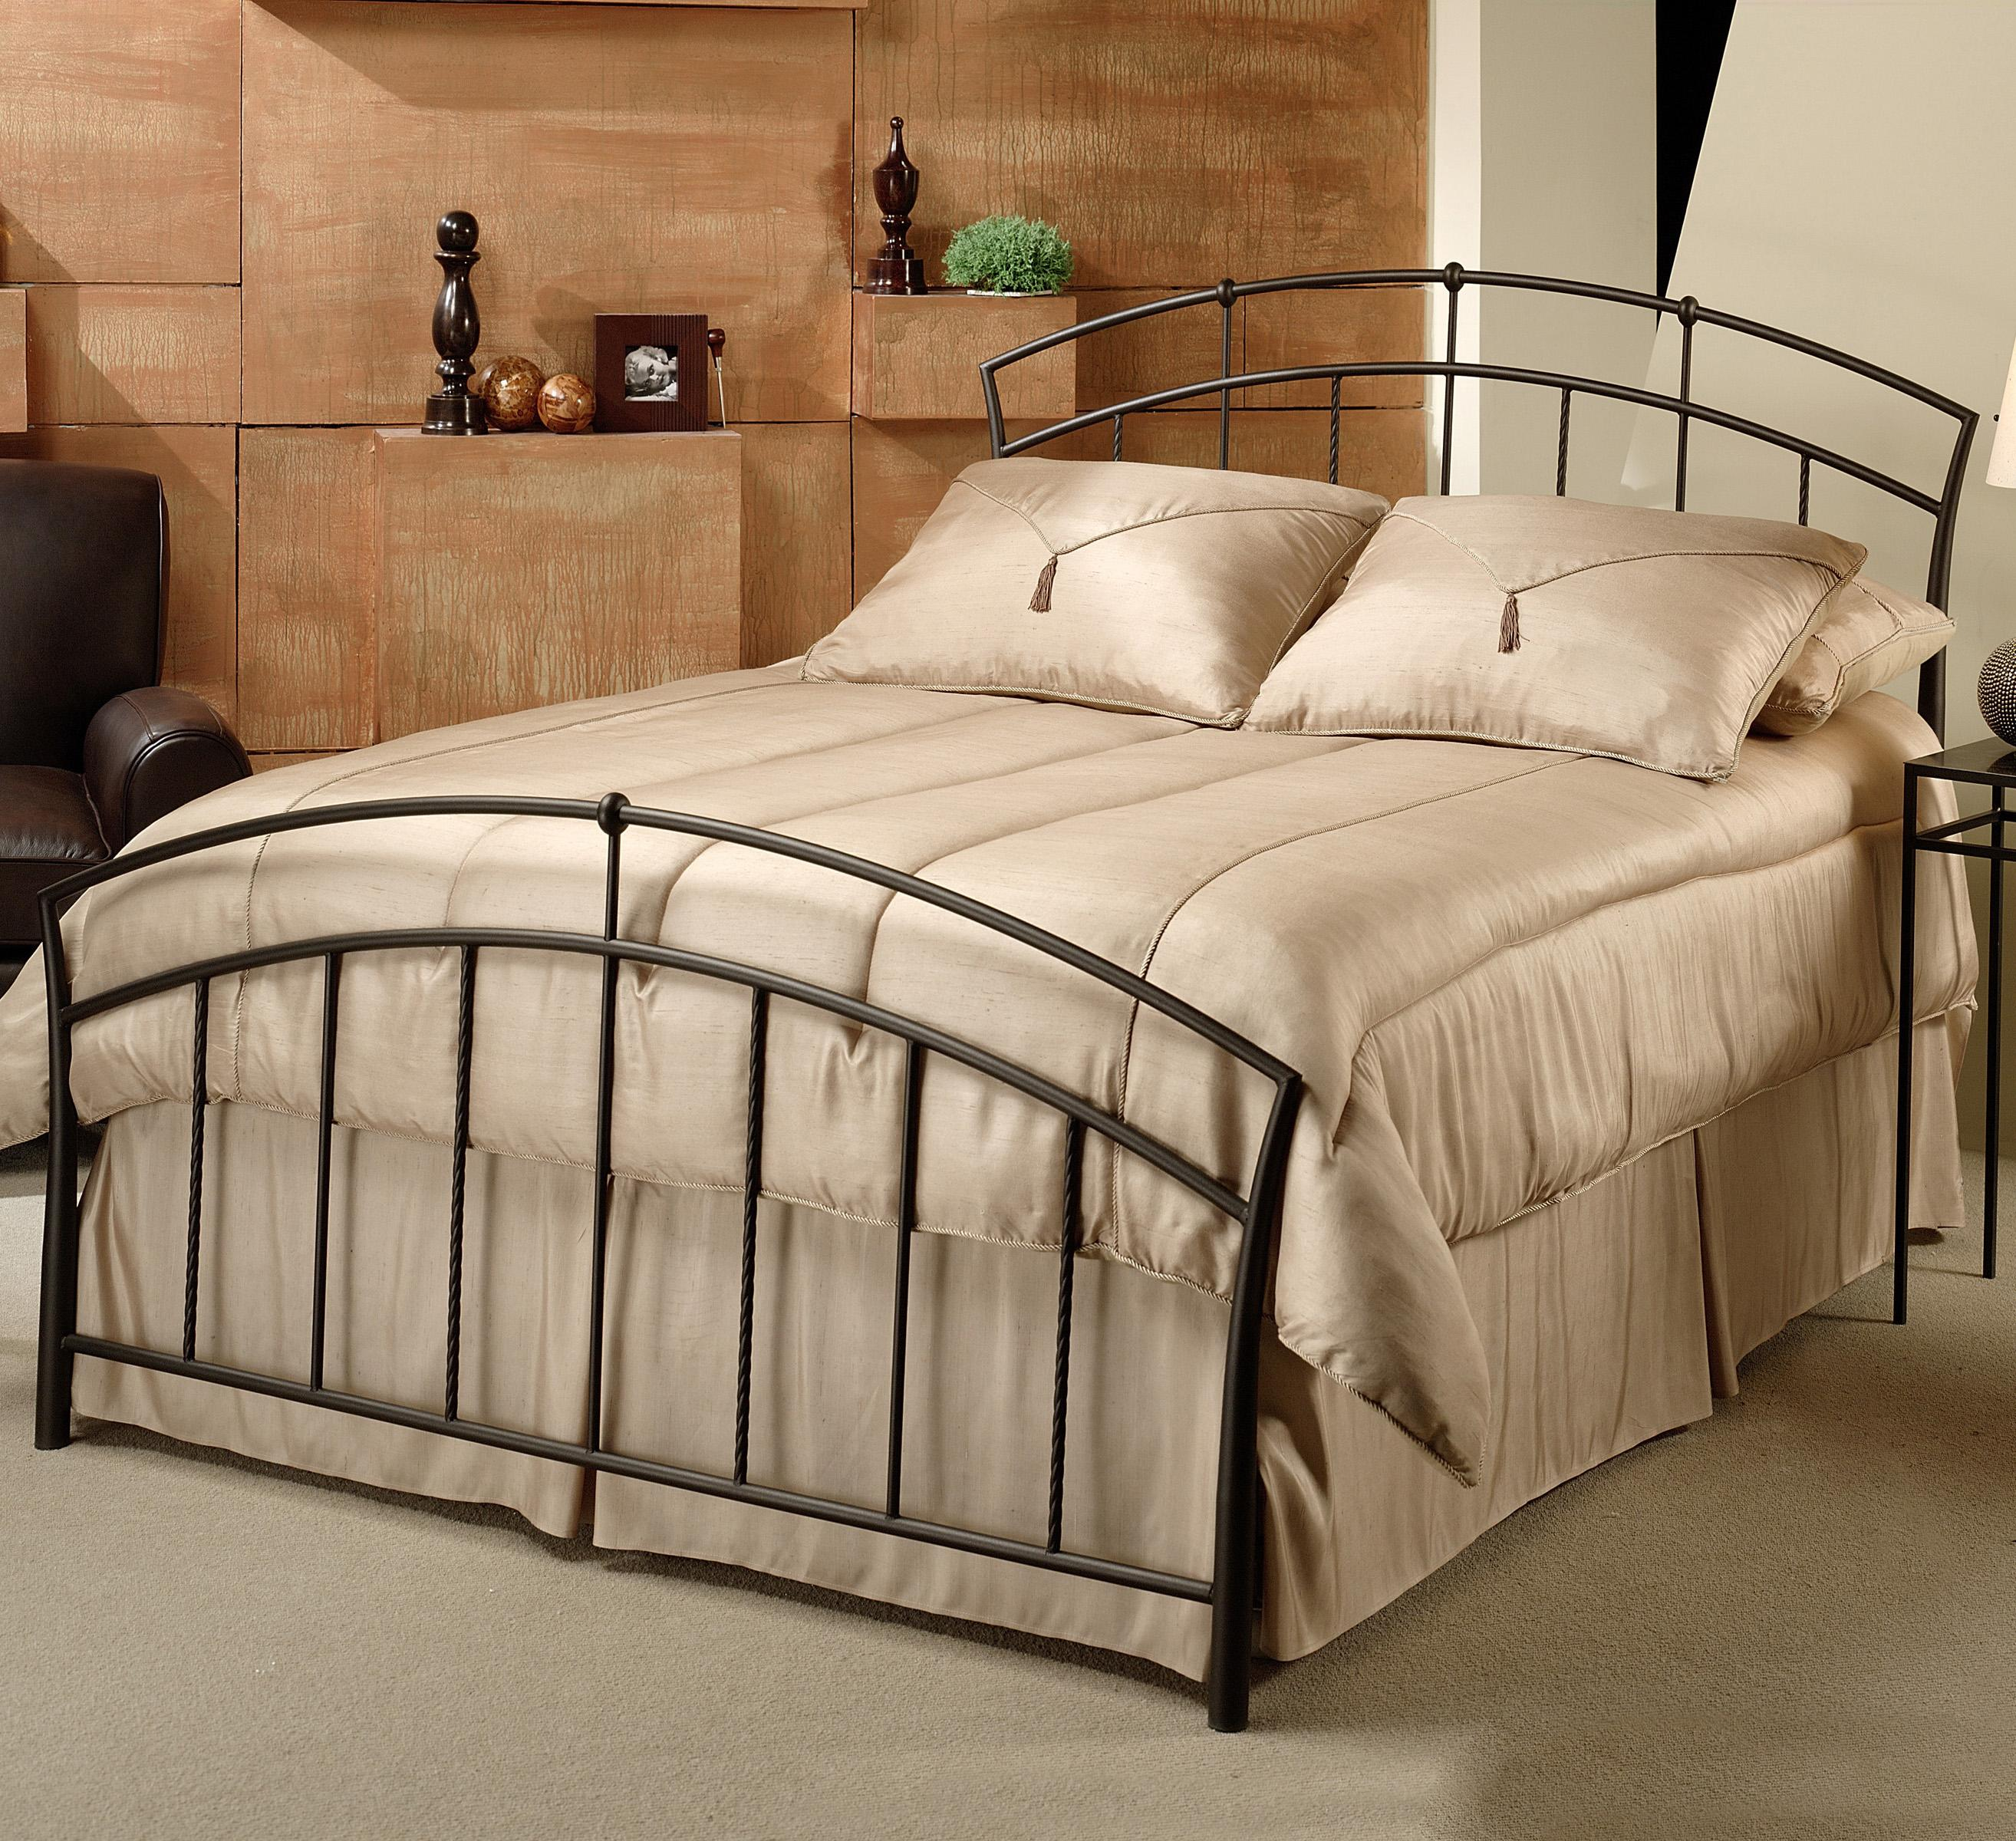 Hillsdale Metal Beds Queen Vancouver Bed - Item Number: 1024BQR